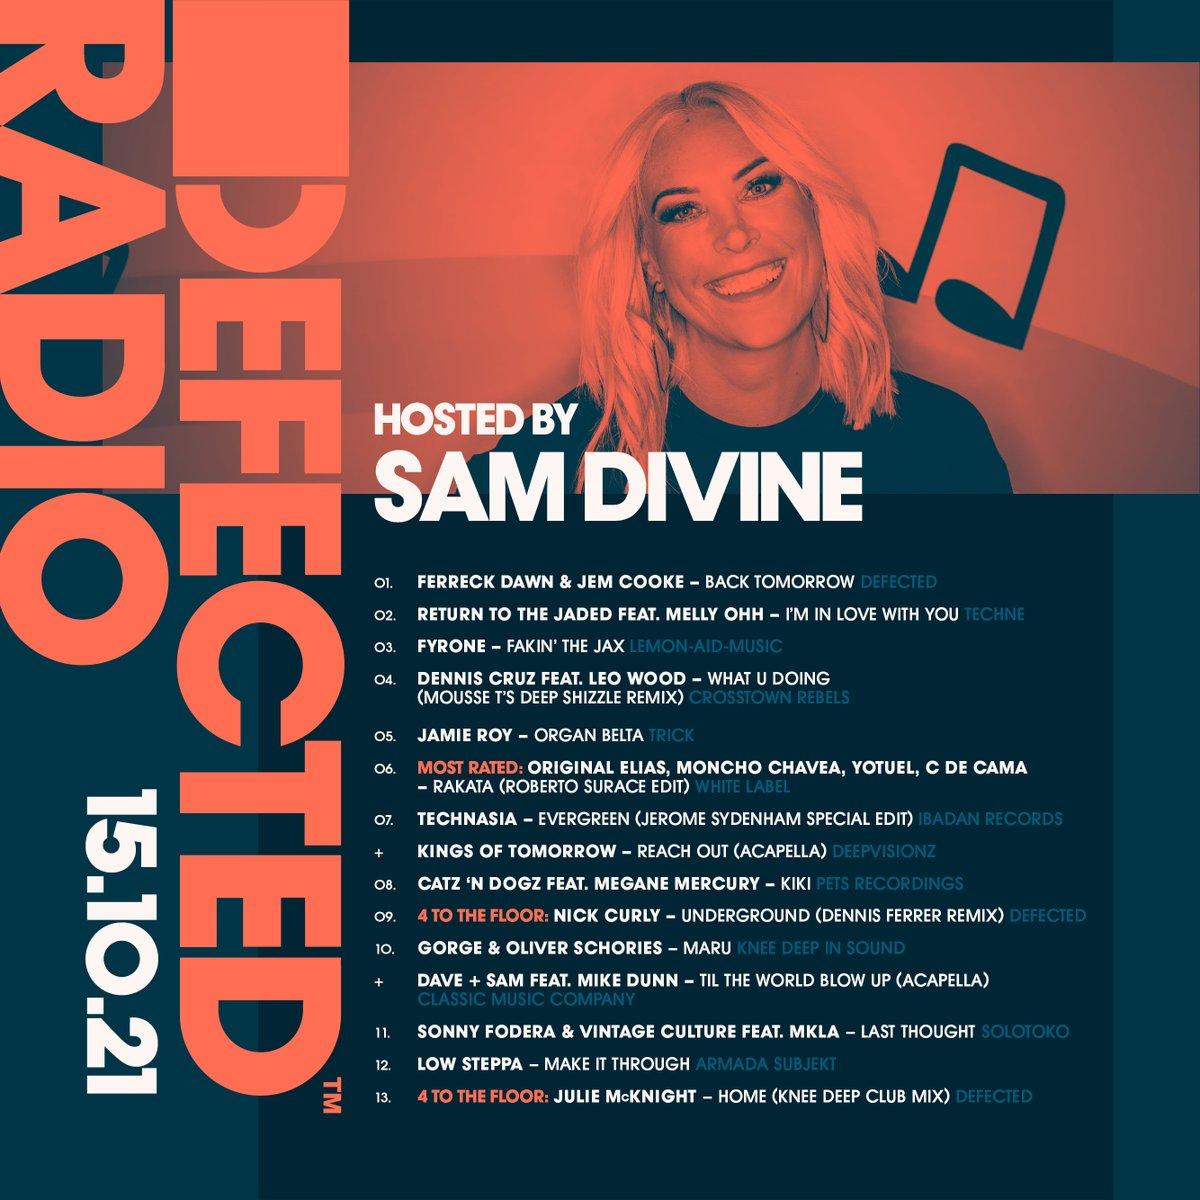 .@samdivine delivering this week's heat. Music from @denniscruzdj @moussetofficial @sonnyfodera @VintageCulture @jamieroyuk @Catz_n_Dogz @Lowsteppa & more... DefectedRadio.lnk.to/Shows